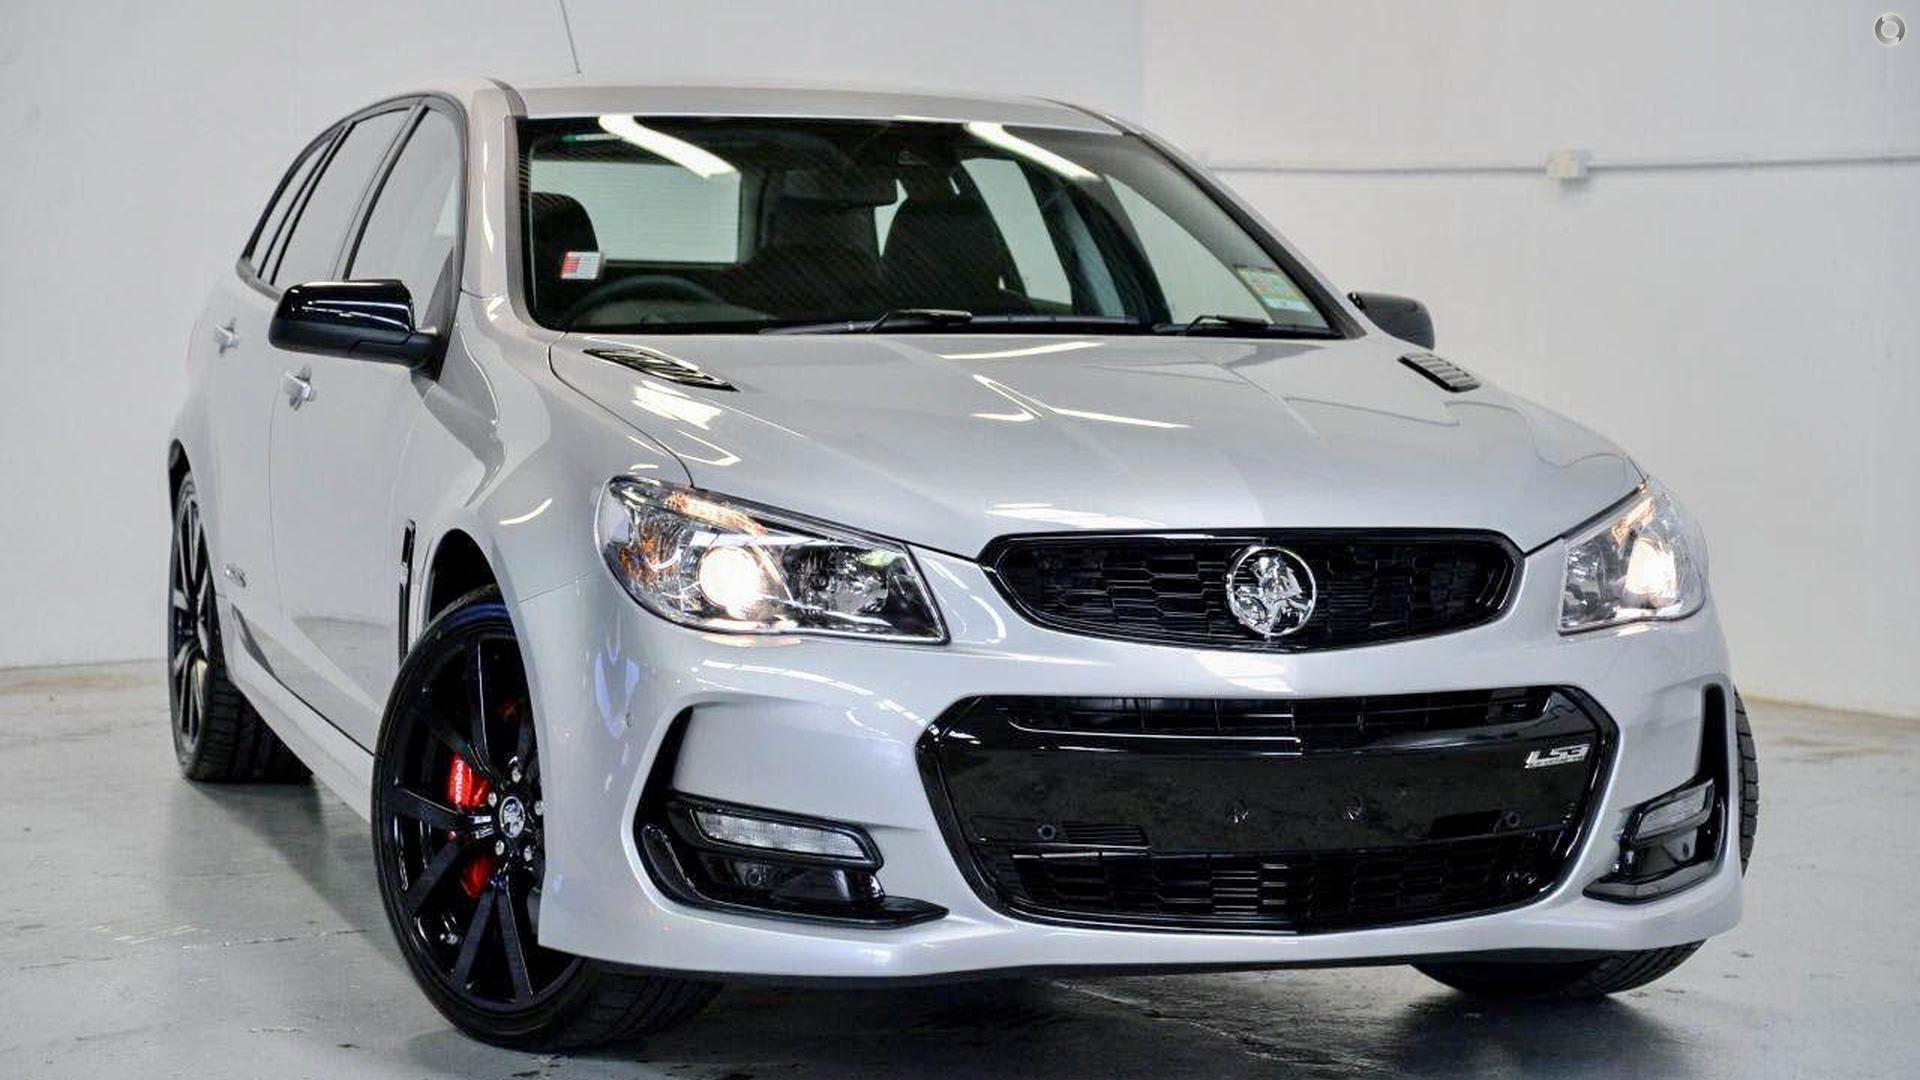 2017 Holden Commodore VF Series II